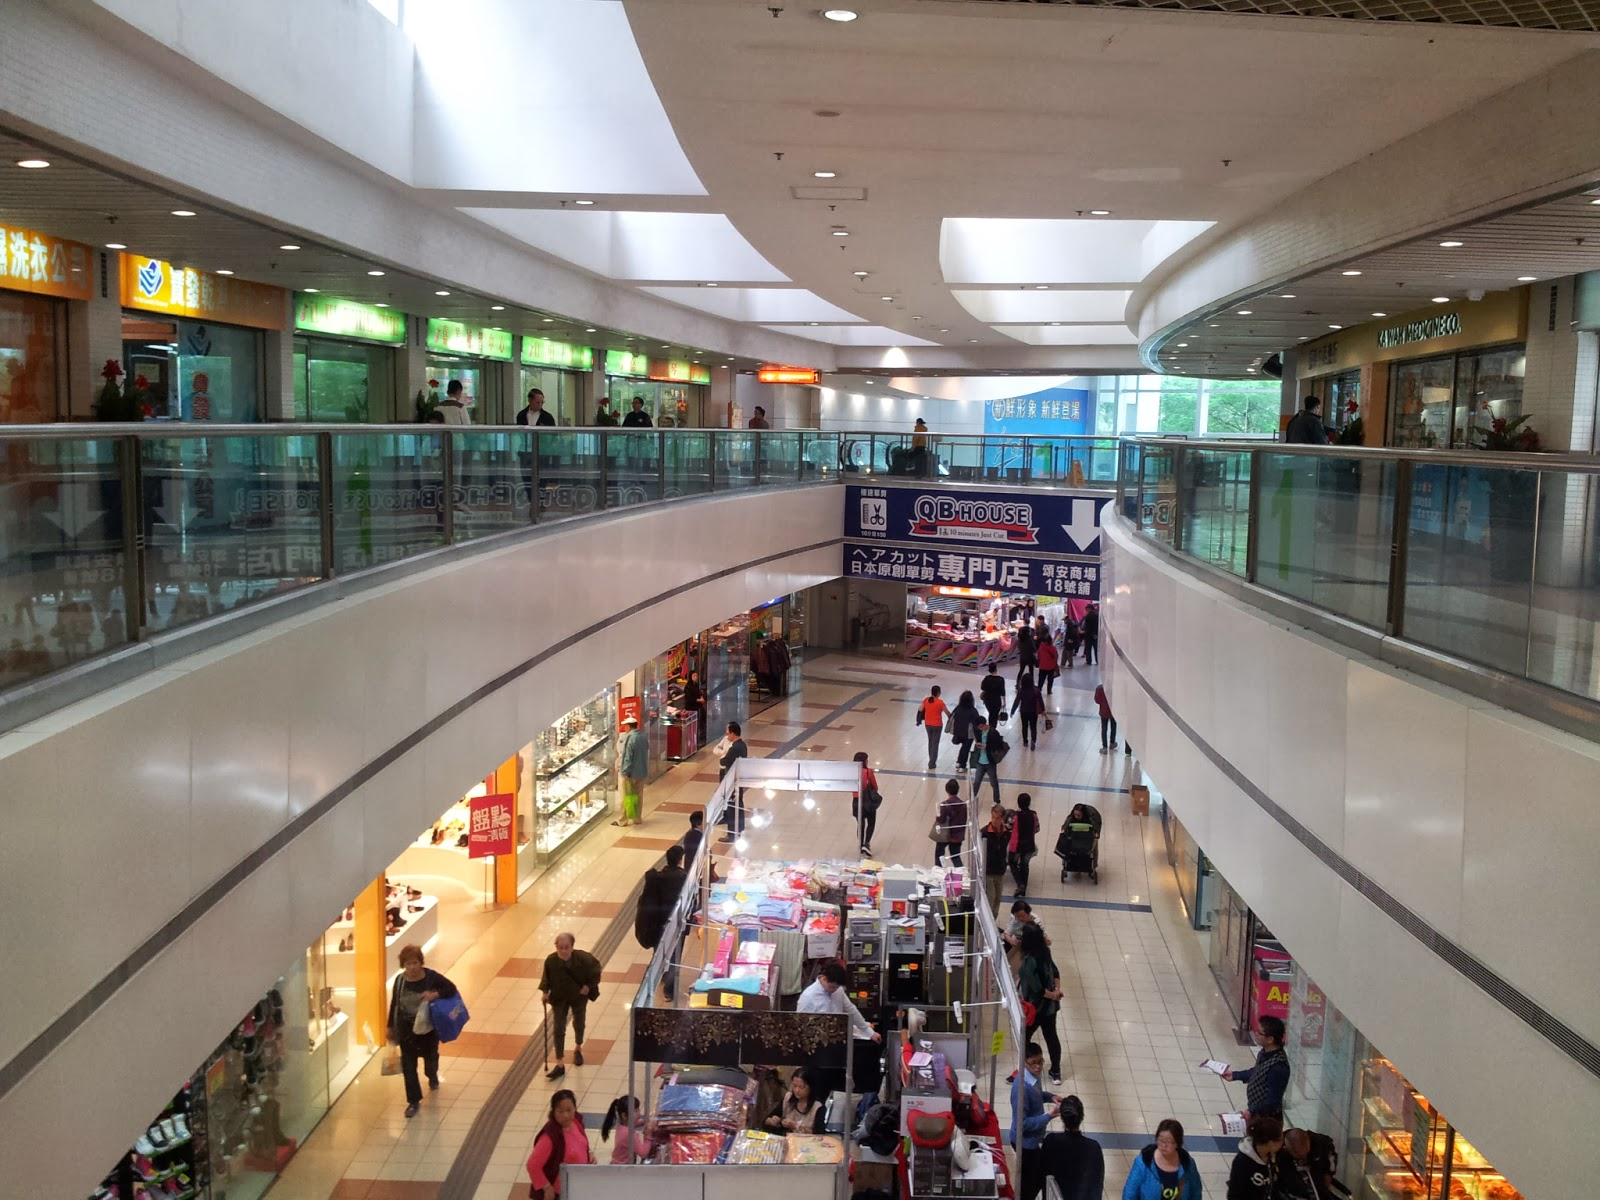 Grassroots O2: 巡視業務.領匯.頌安商場 @2014-03-01